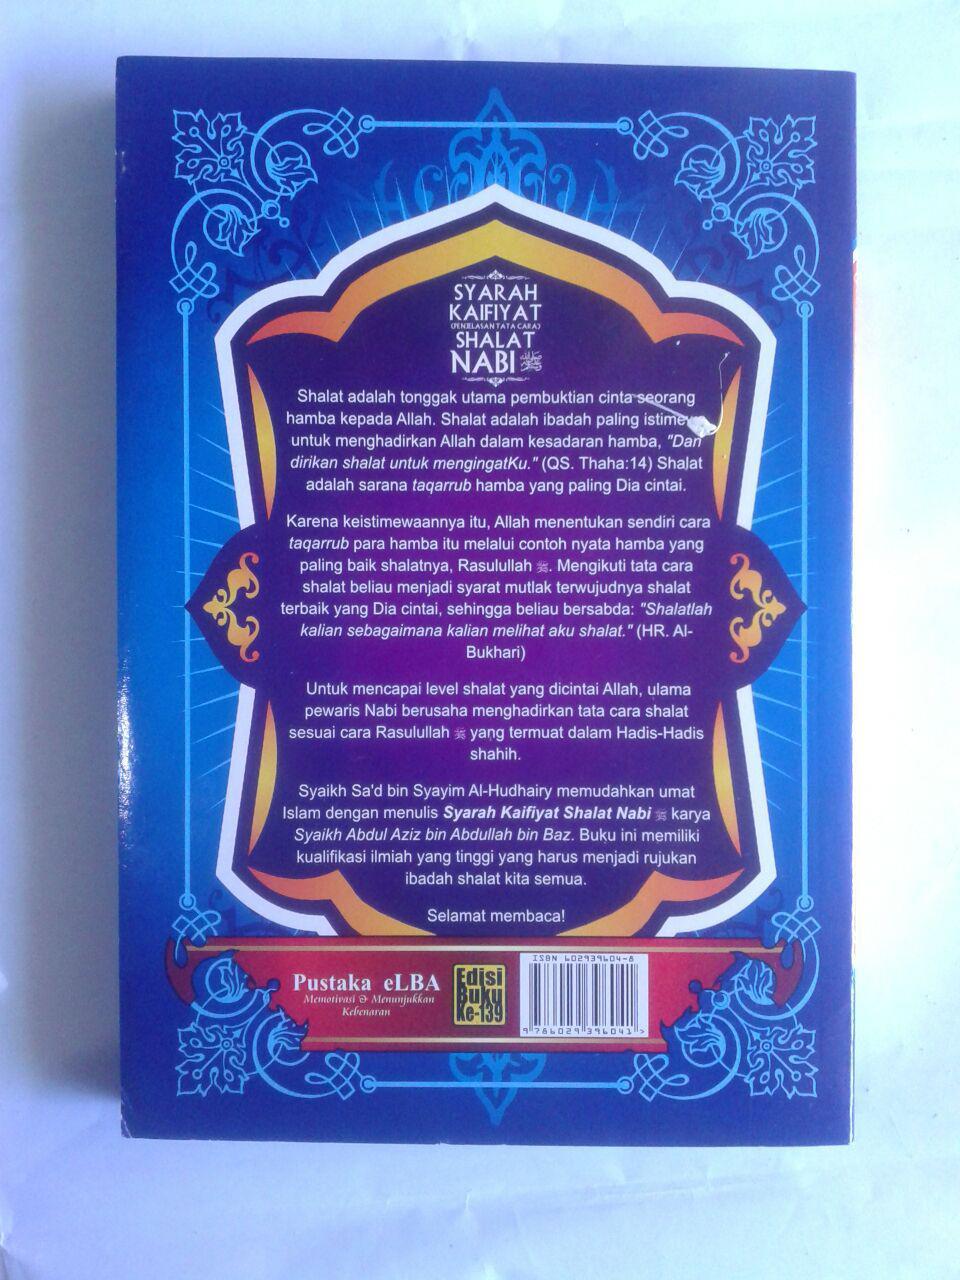 Buku Syarah Kaifiyat Penjelasan Tata Cara Shalat Nabi Syaikh Bin Baz cover